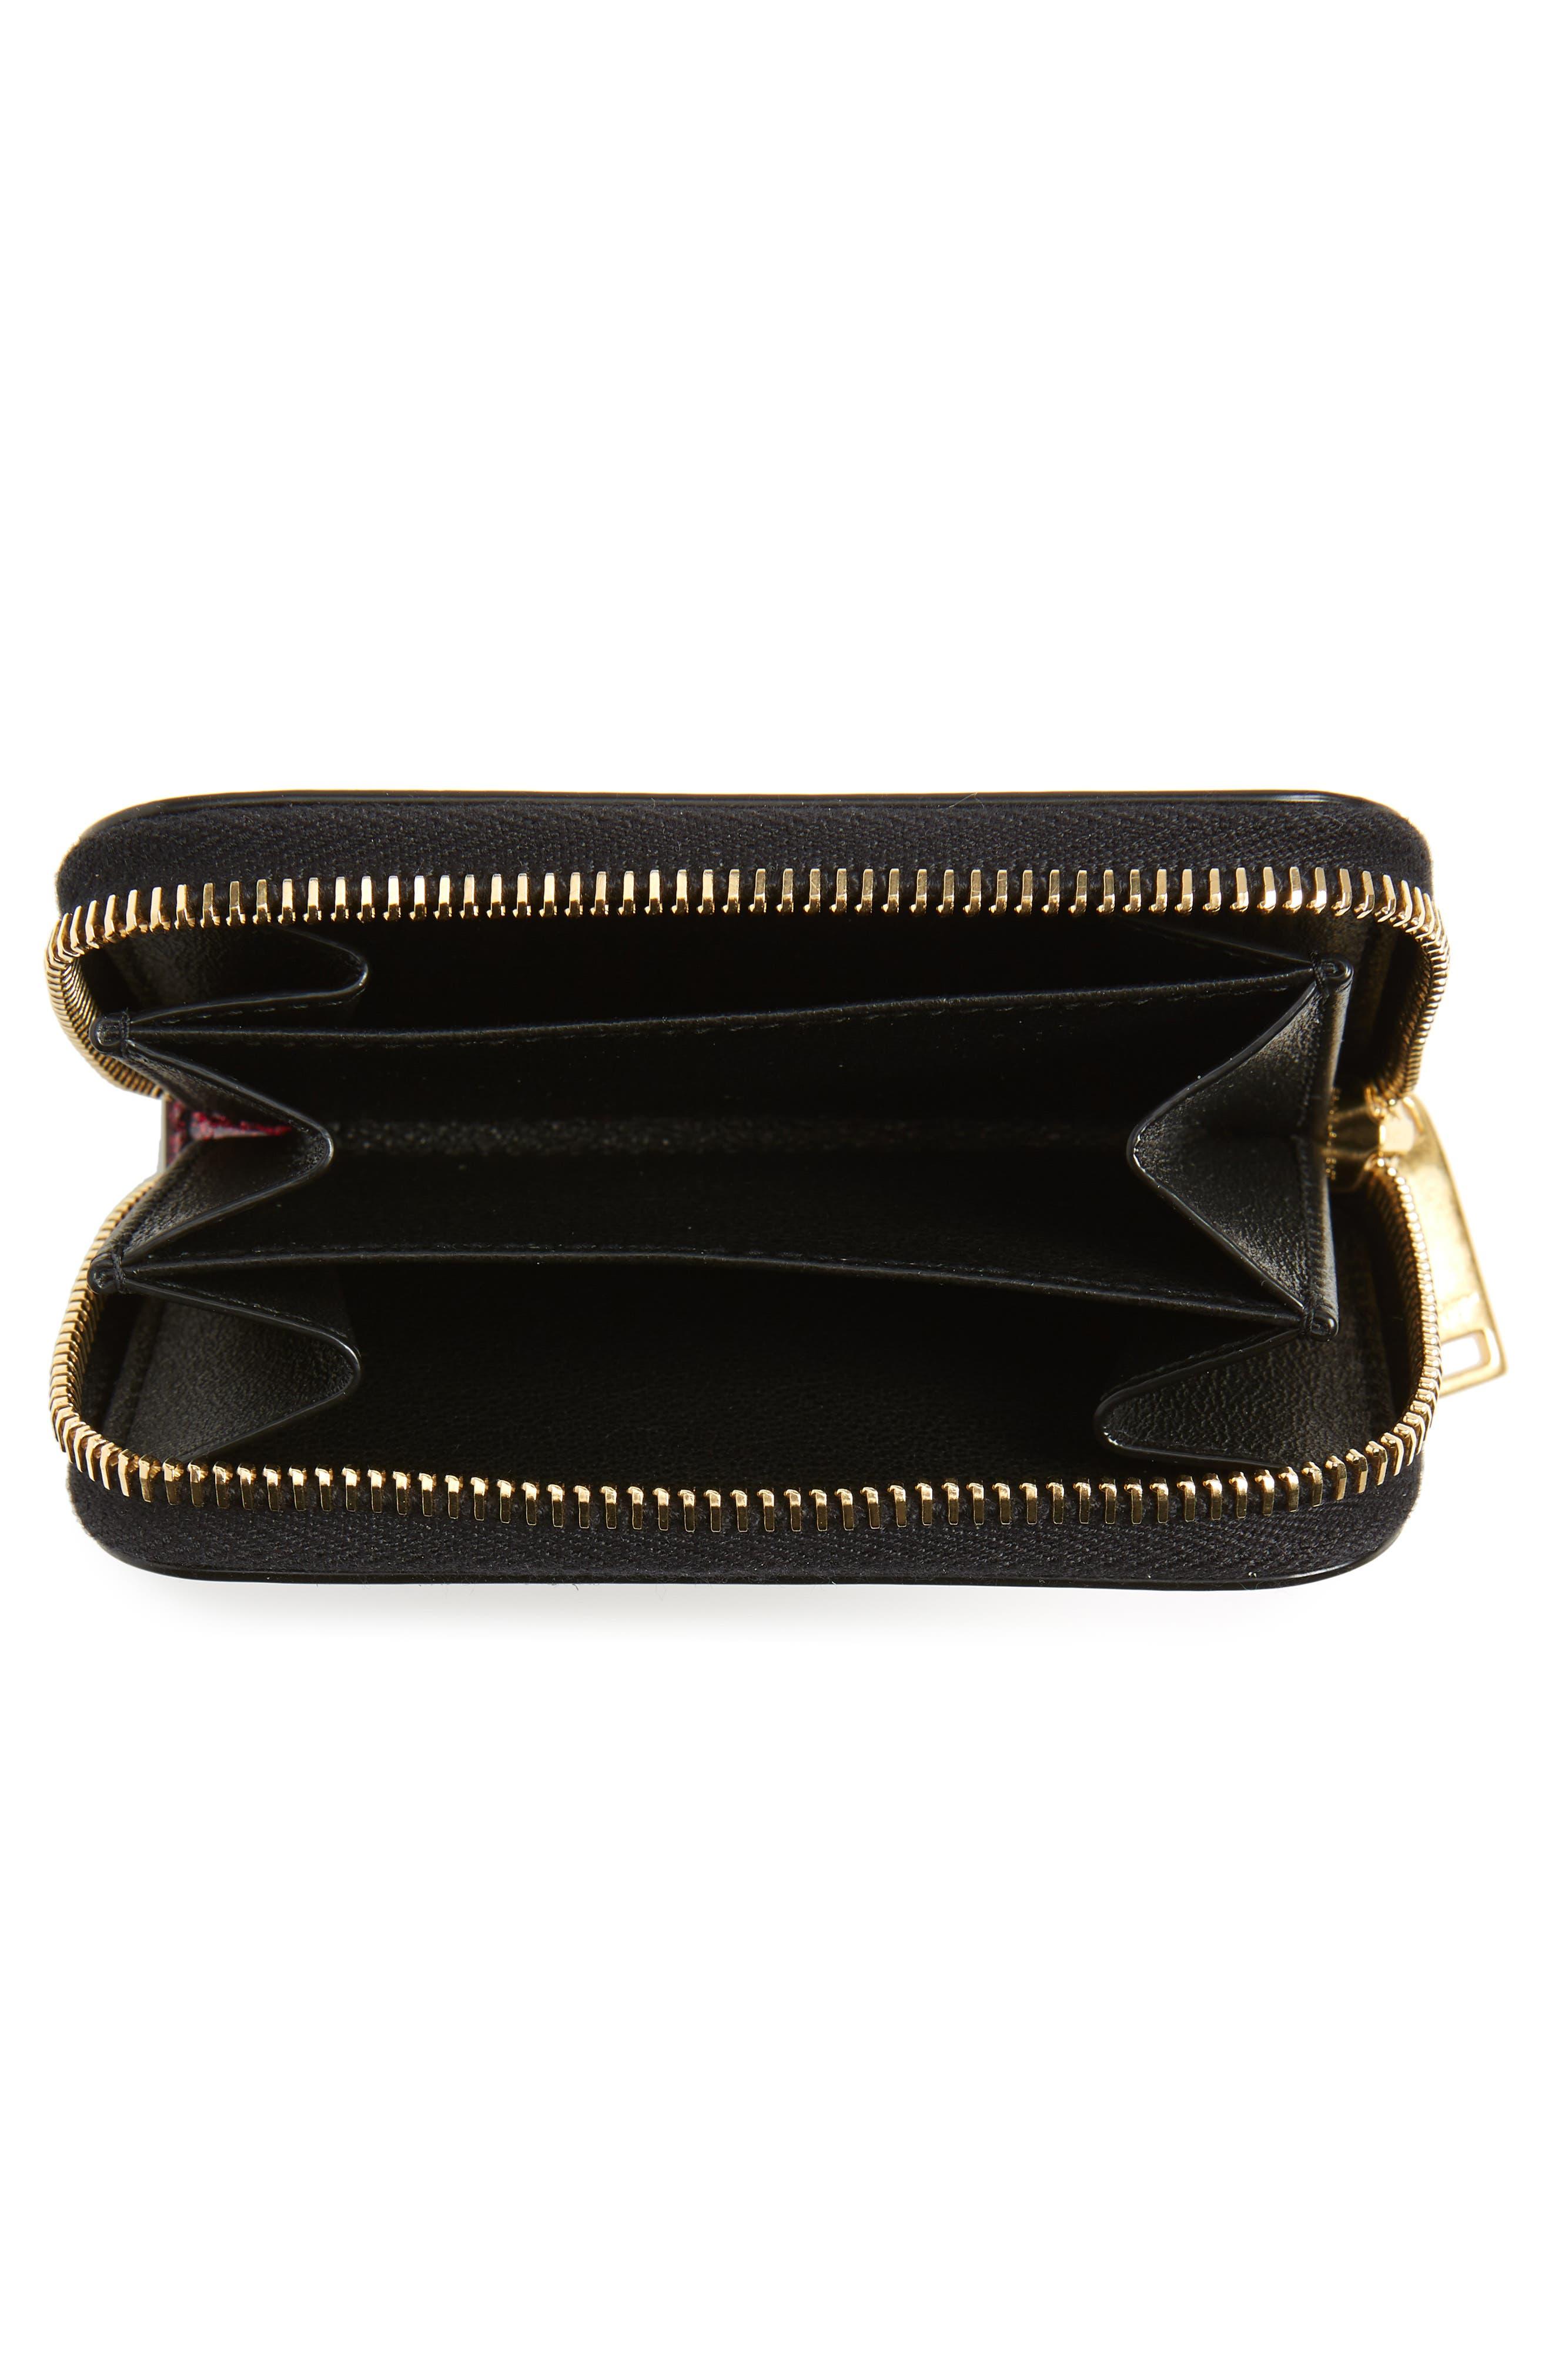 Glitter Calfskin Leather Wallet,                             Alternate thumbnail 2, color,                             SHOCKING PINK/ NOIR